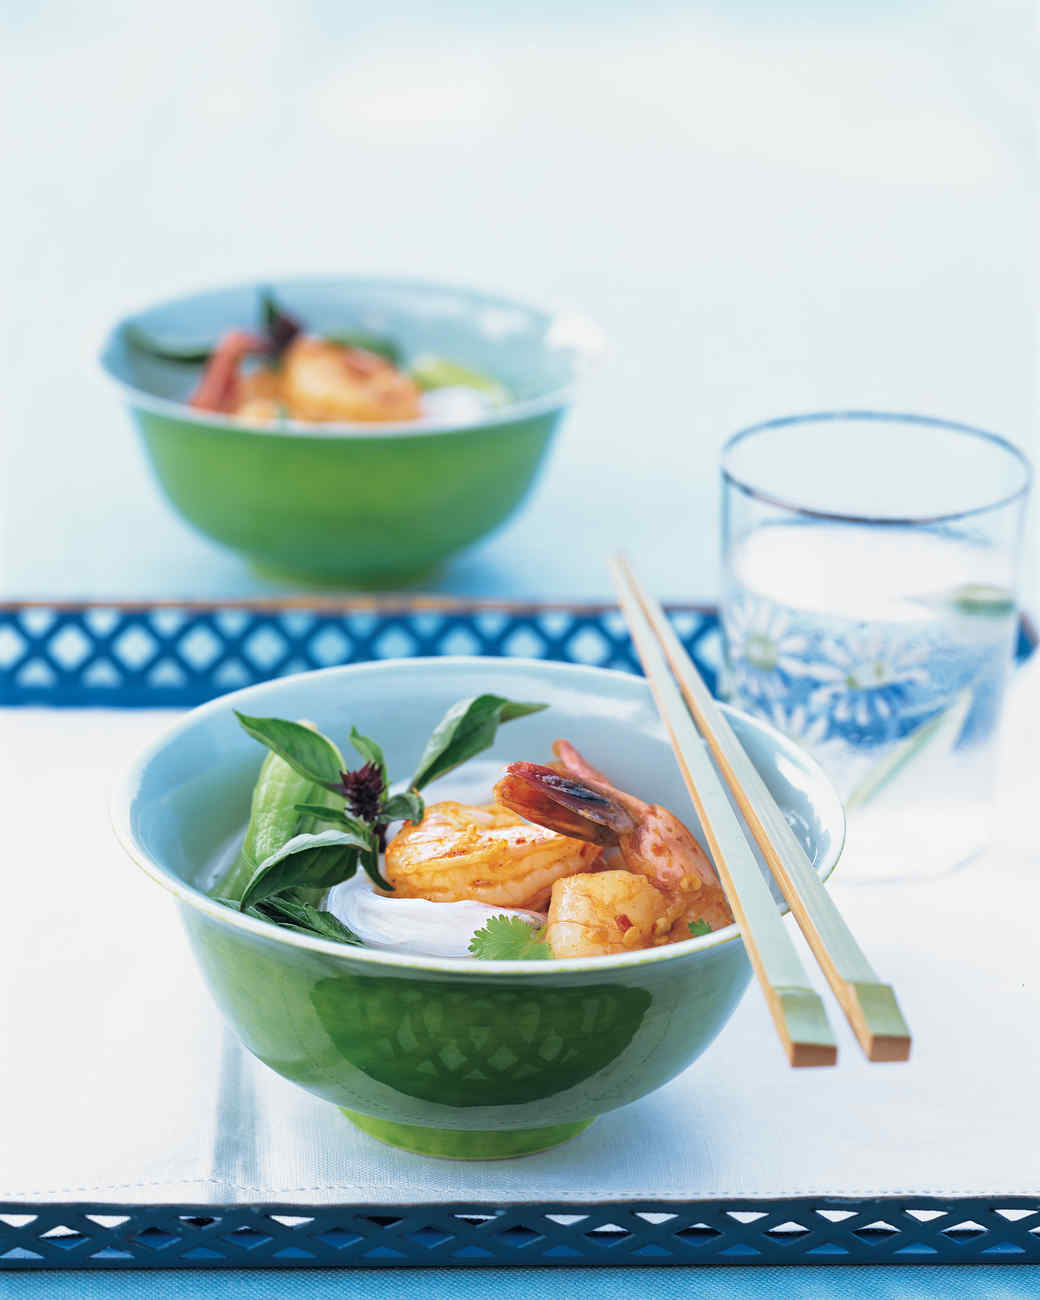 Spicy Stir-Fried Shrimp